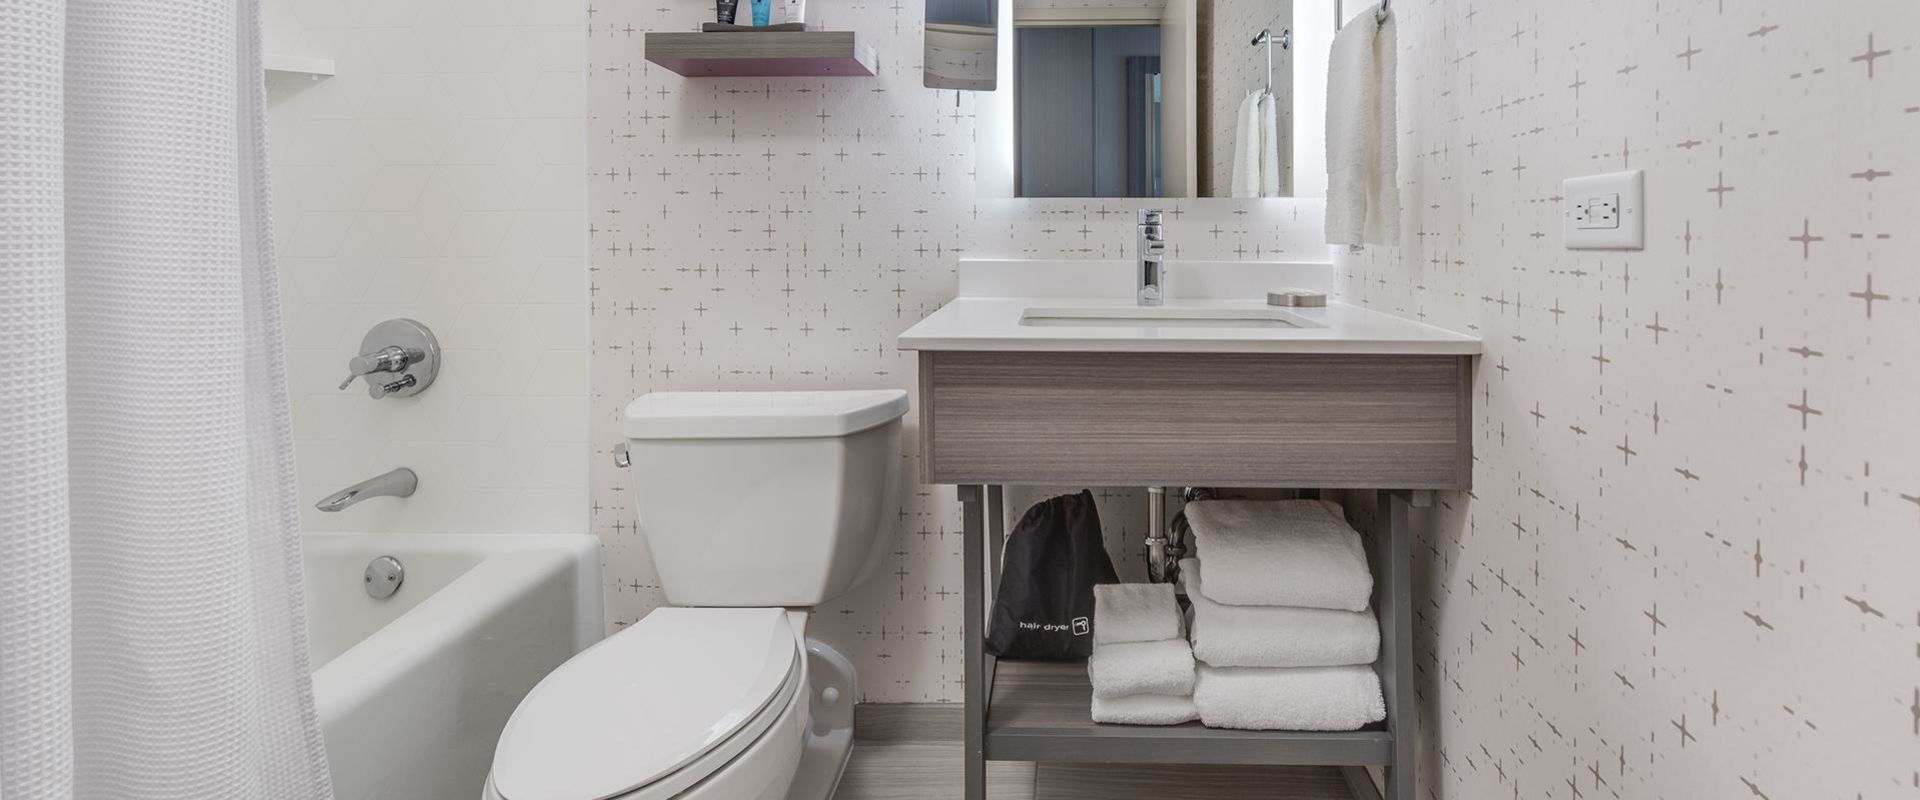 Denver Guest Room Bathroom Interior